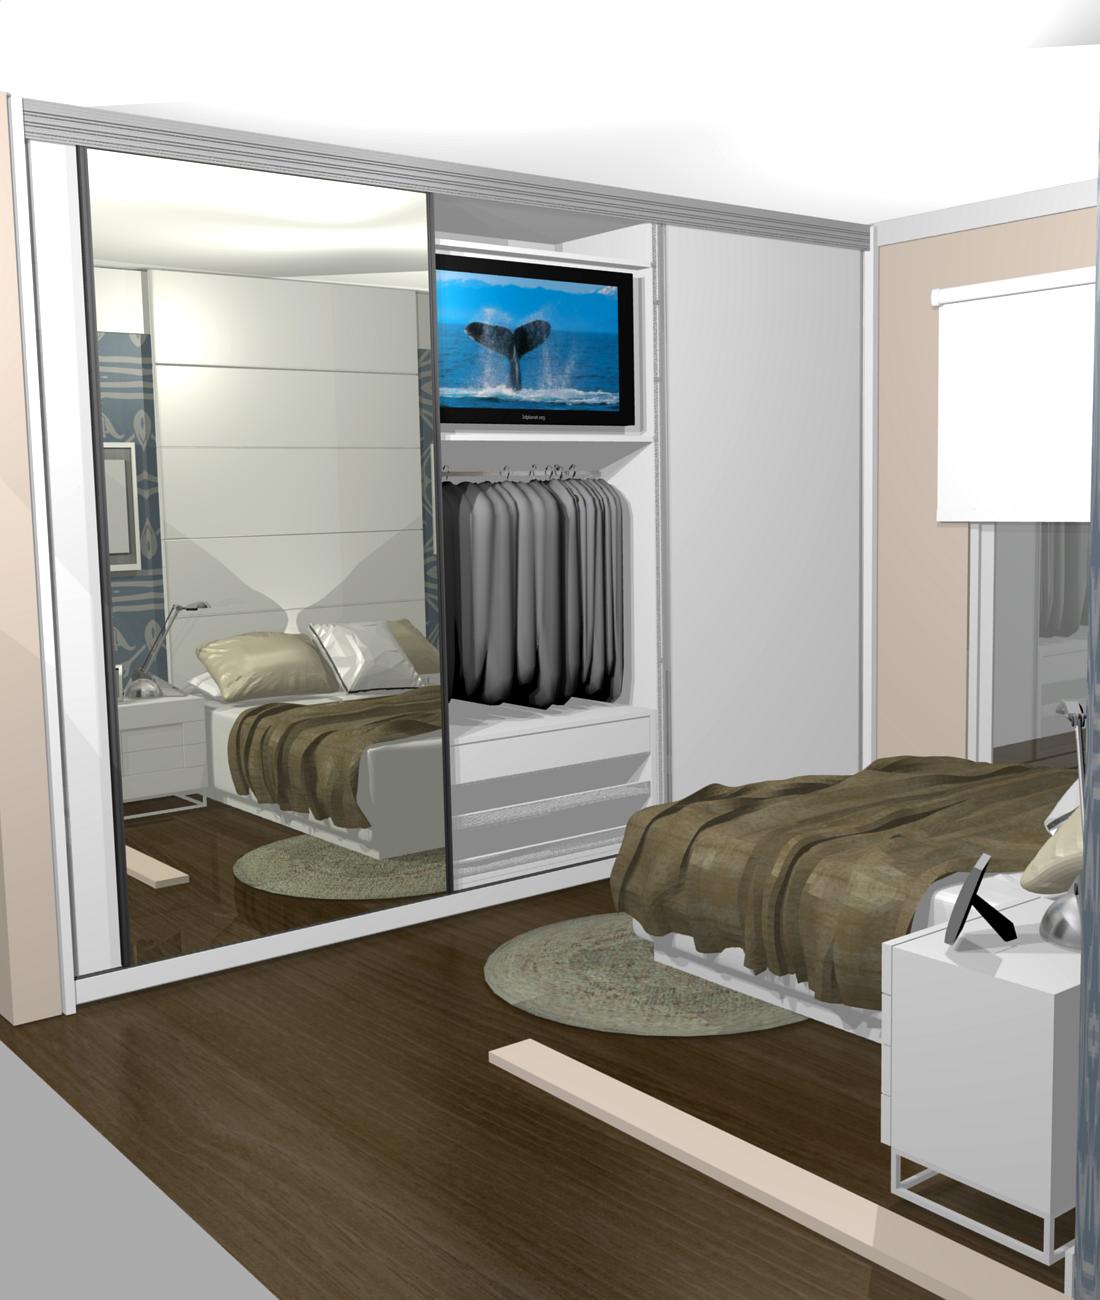 Aparador Leroy Merlyn ~ armarios+planejados+quarto+bebe+moveis+para+loja+painel+para+tv+lcd+closet+pequeno+moveis+para